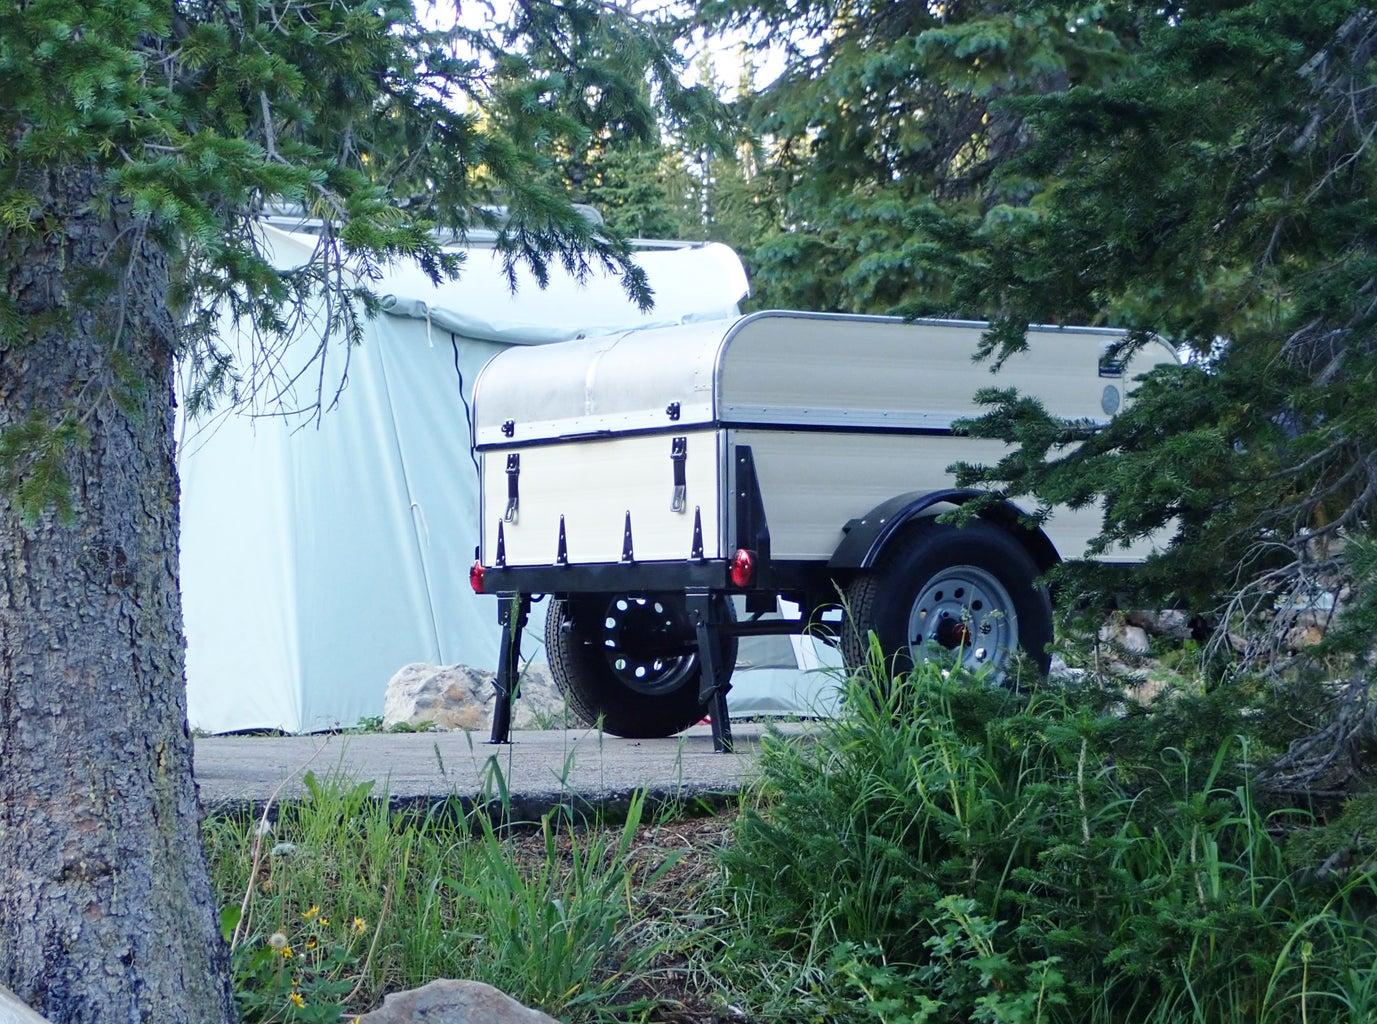 Retro-Style Camping Gear Trailer